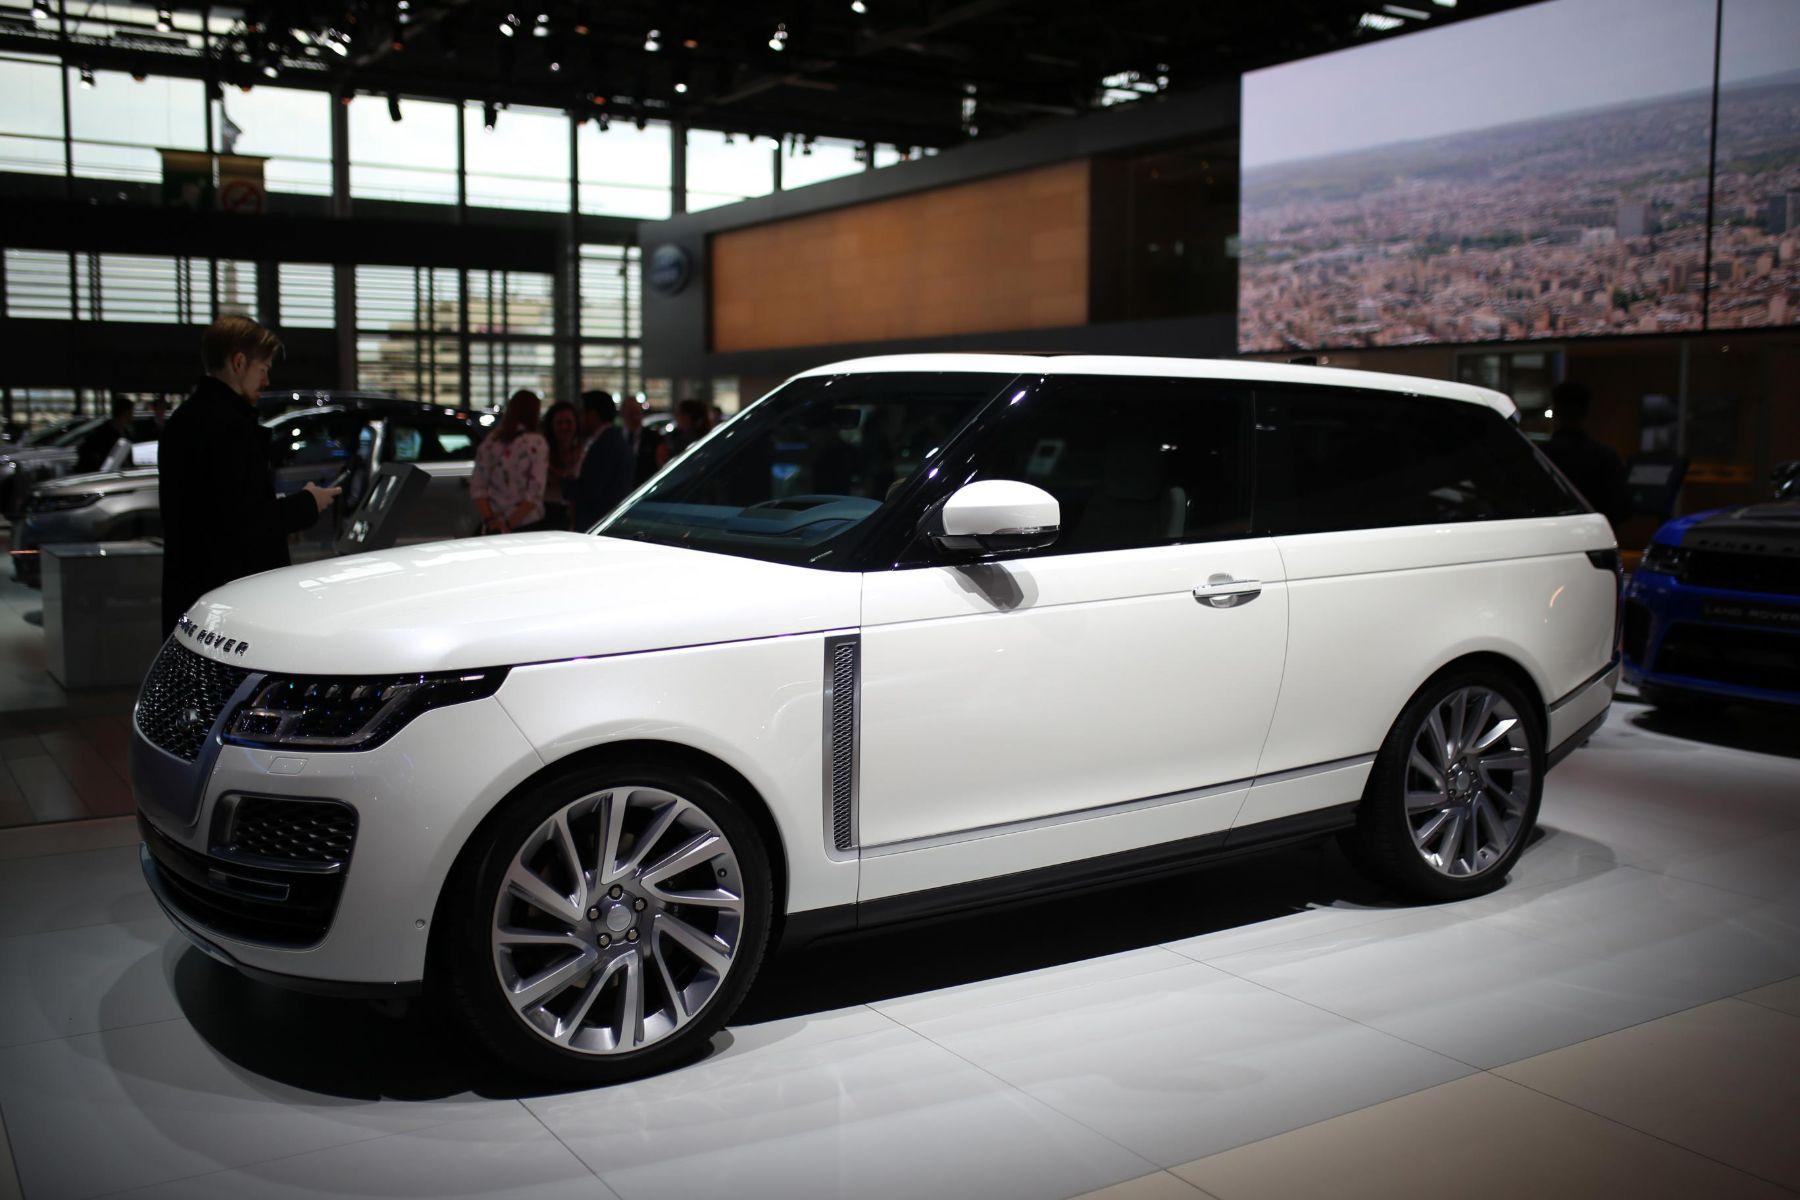 Range Rover SVCoupe